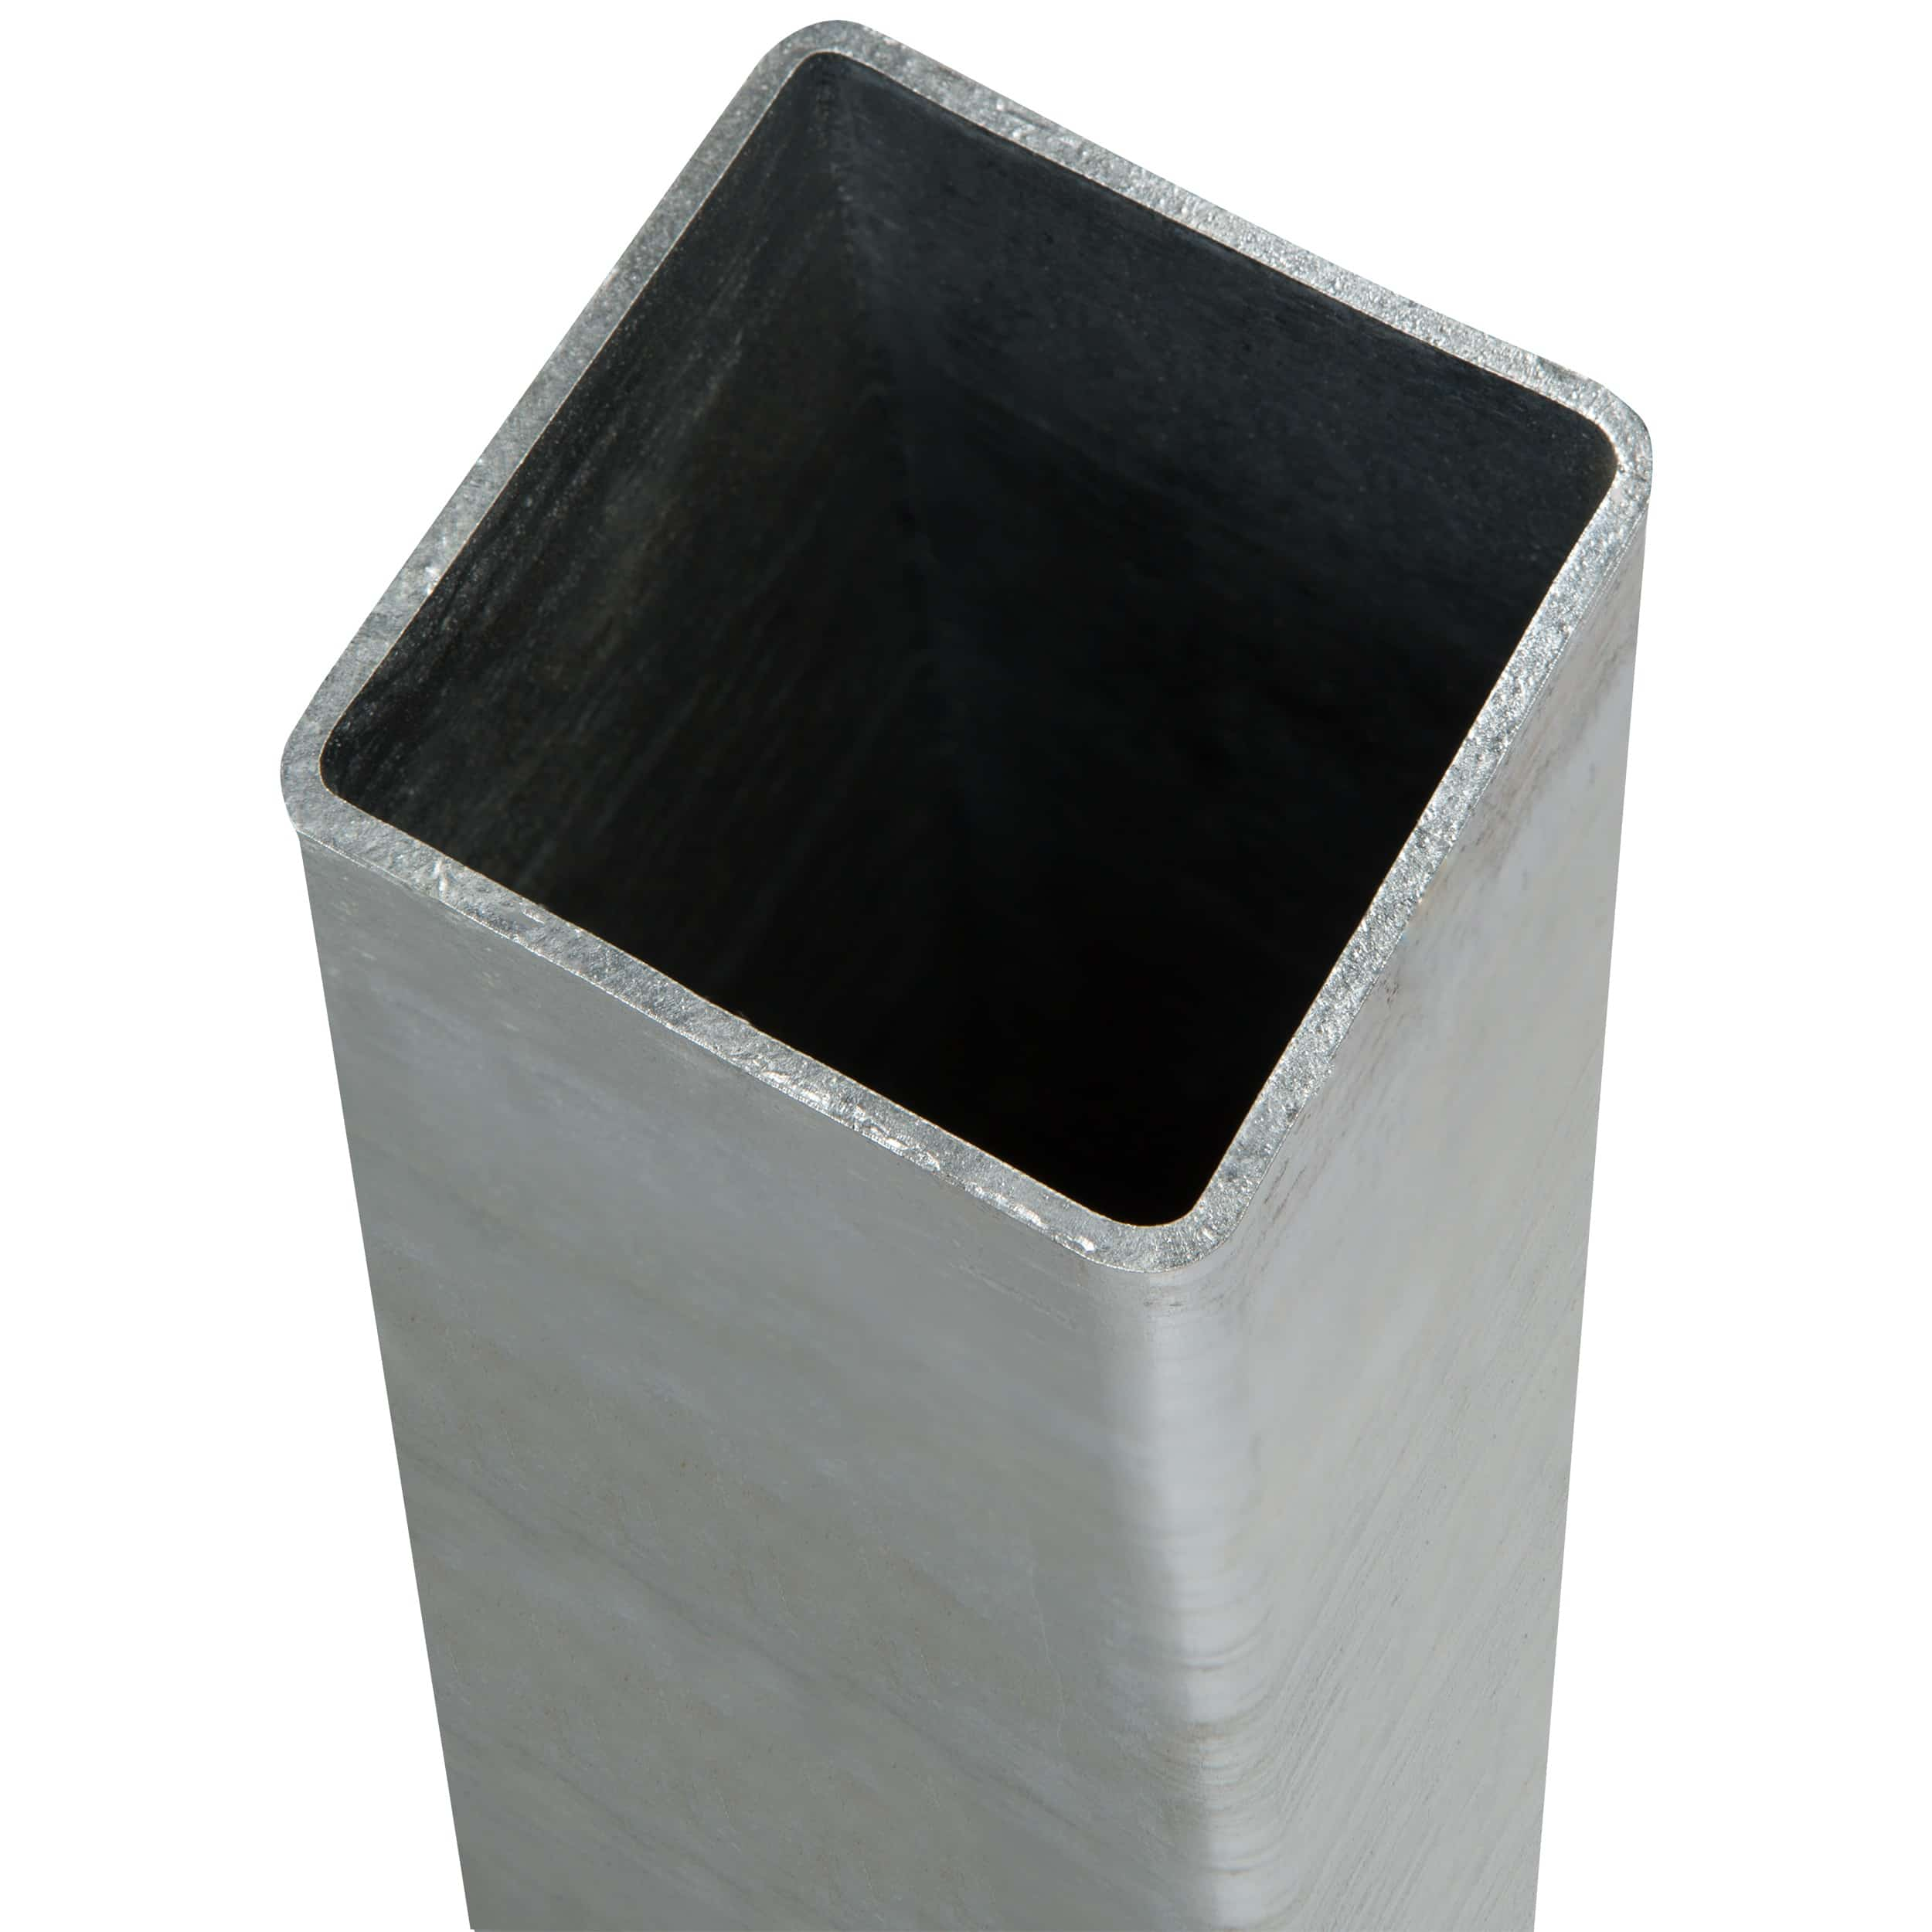 Fencemate DuraPost Corner Post 75mm x 75mm